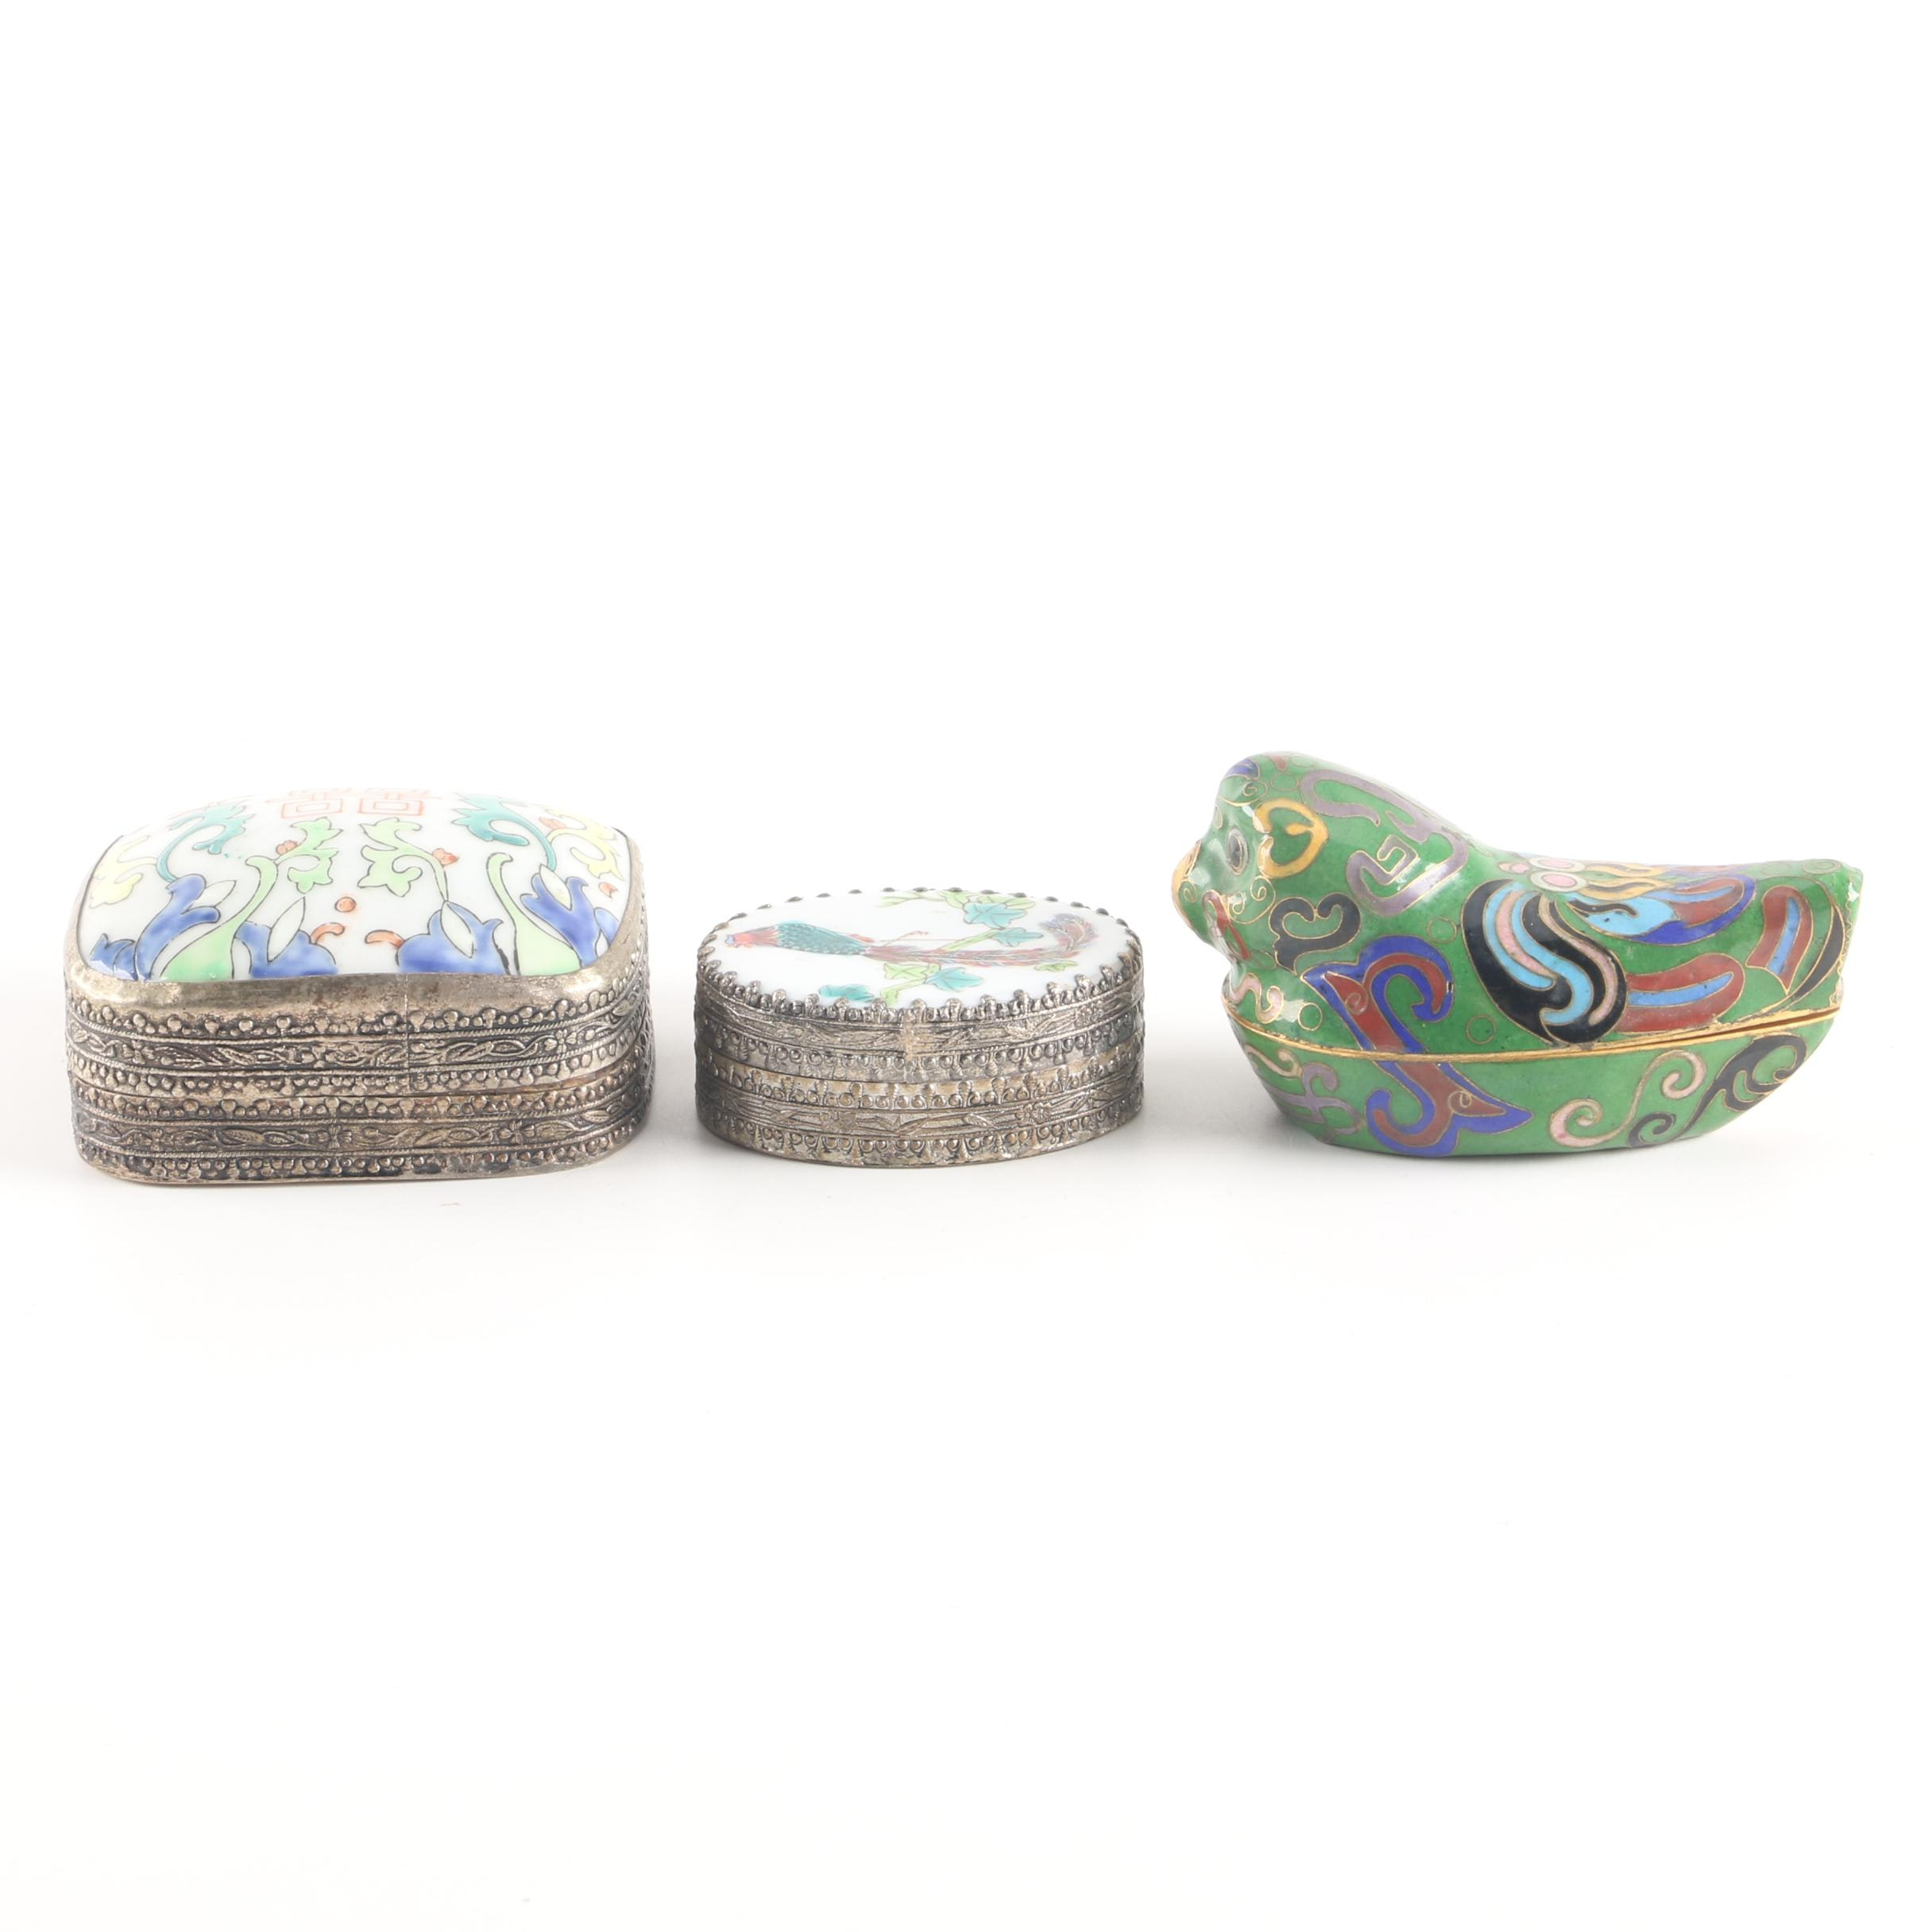 Chinese Inspired Enameled Trinket Boxes